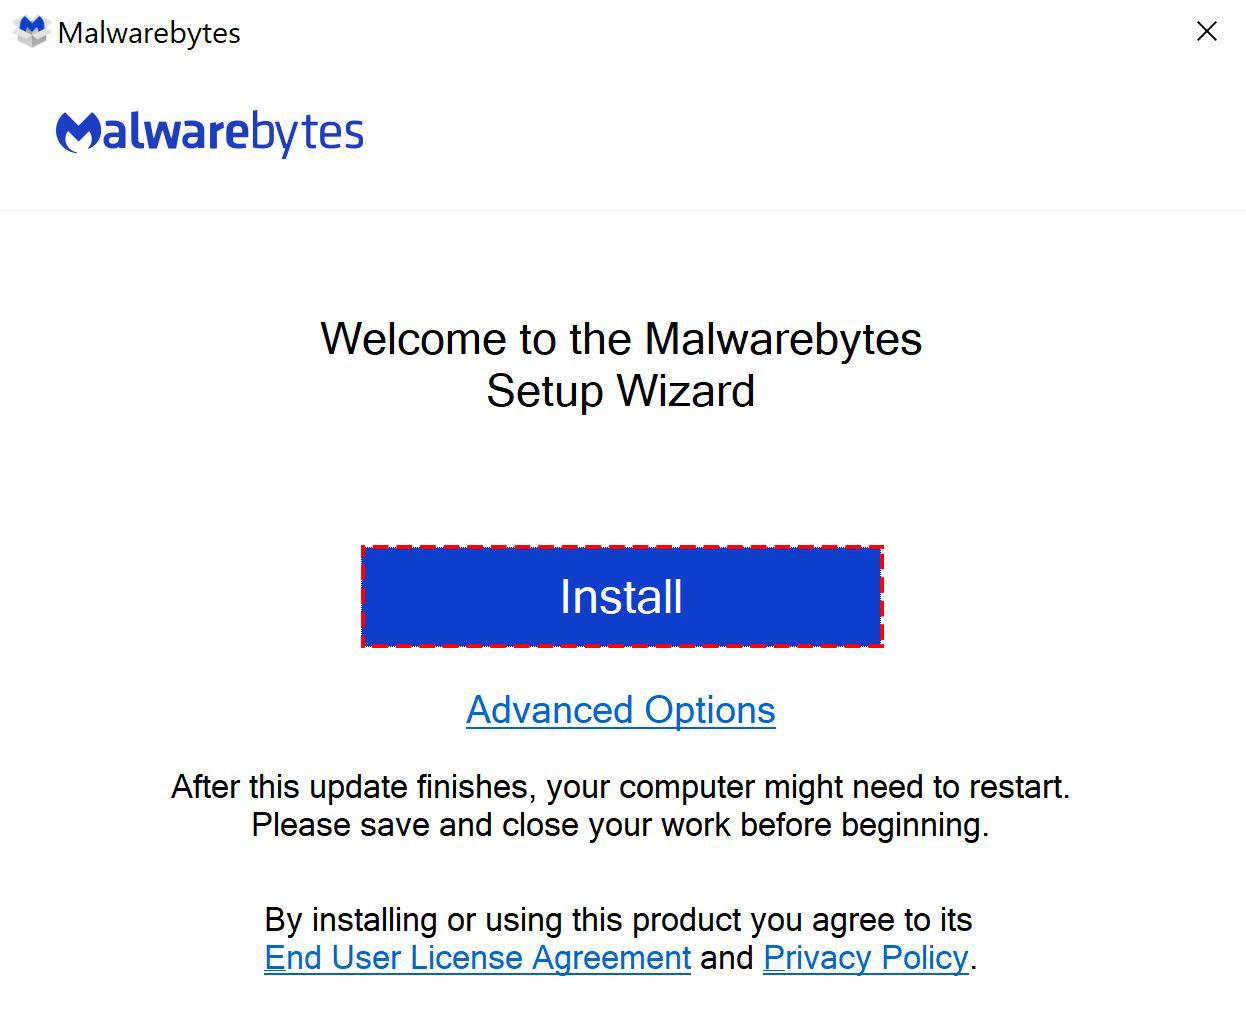 Malwarebytes for Windows - install